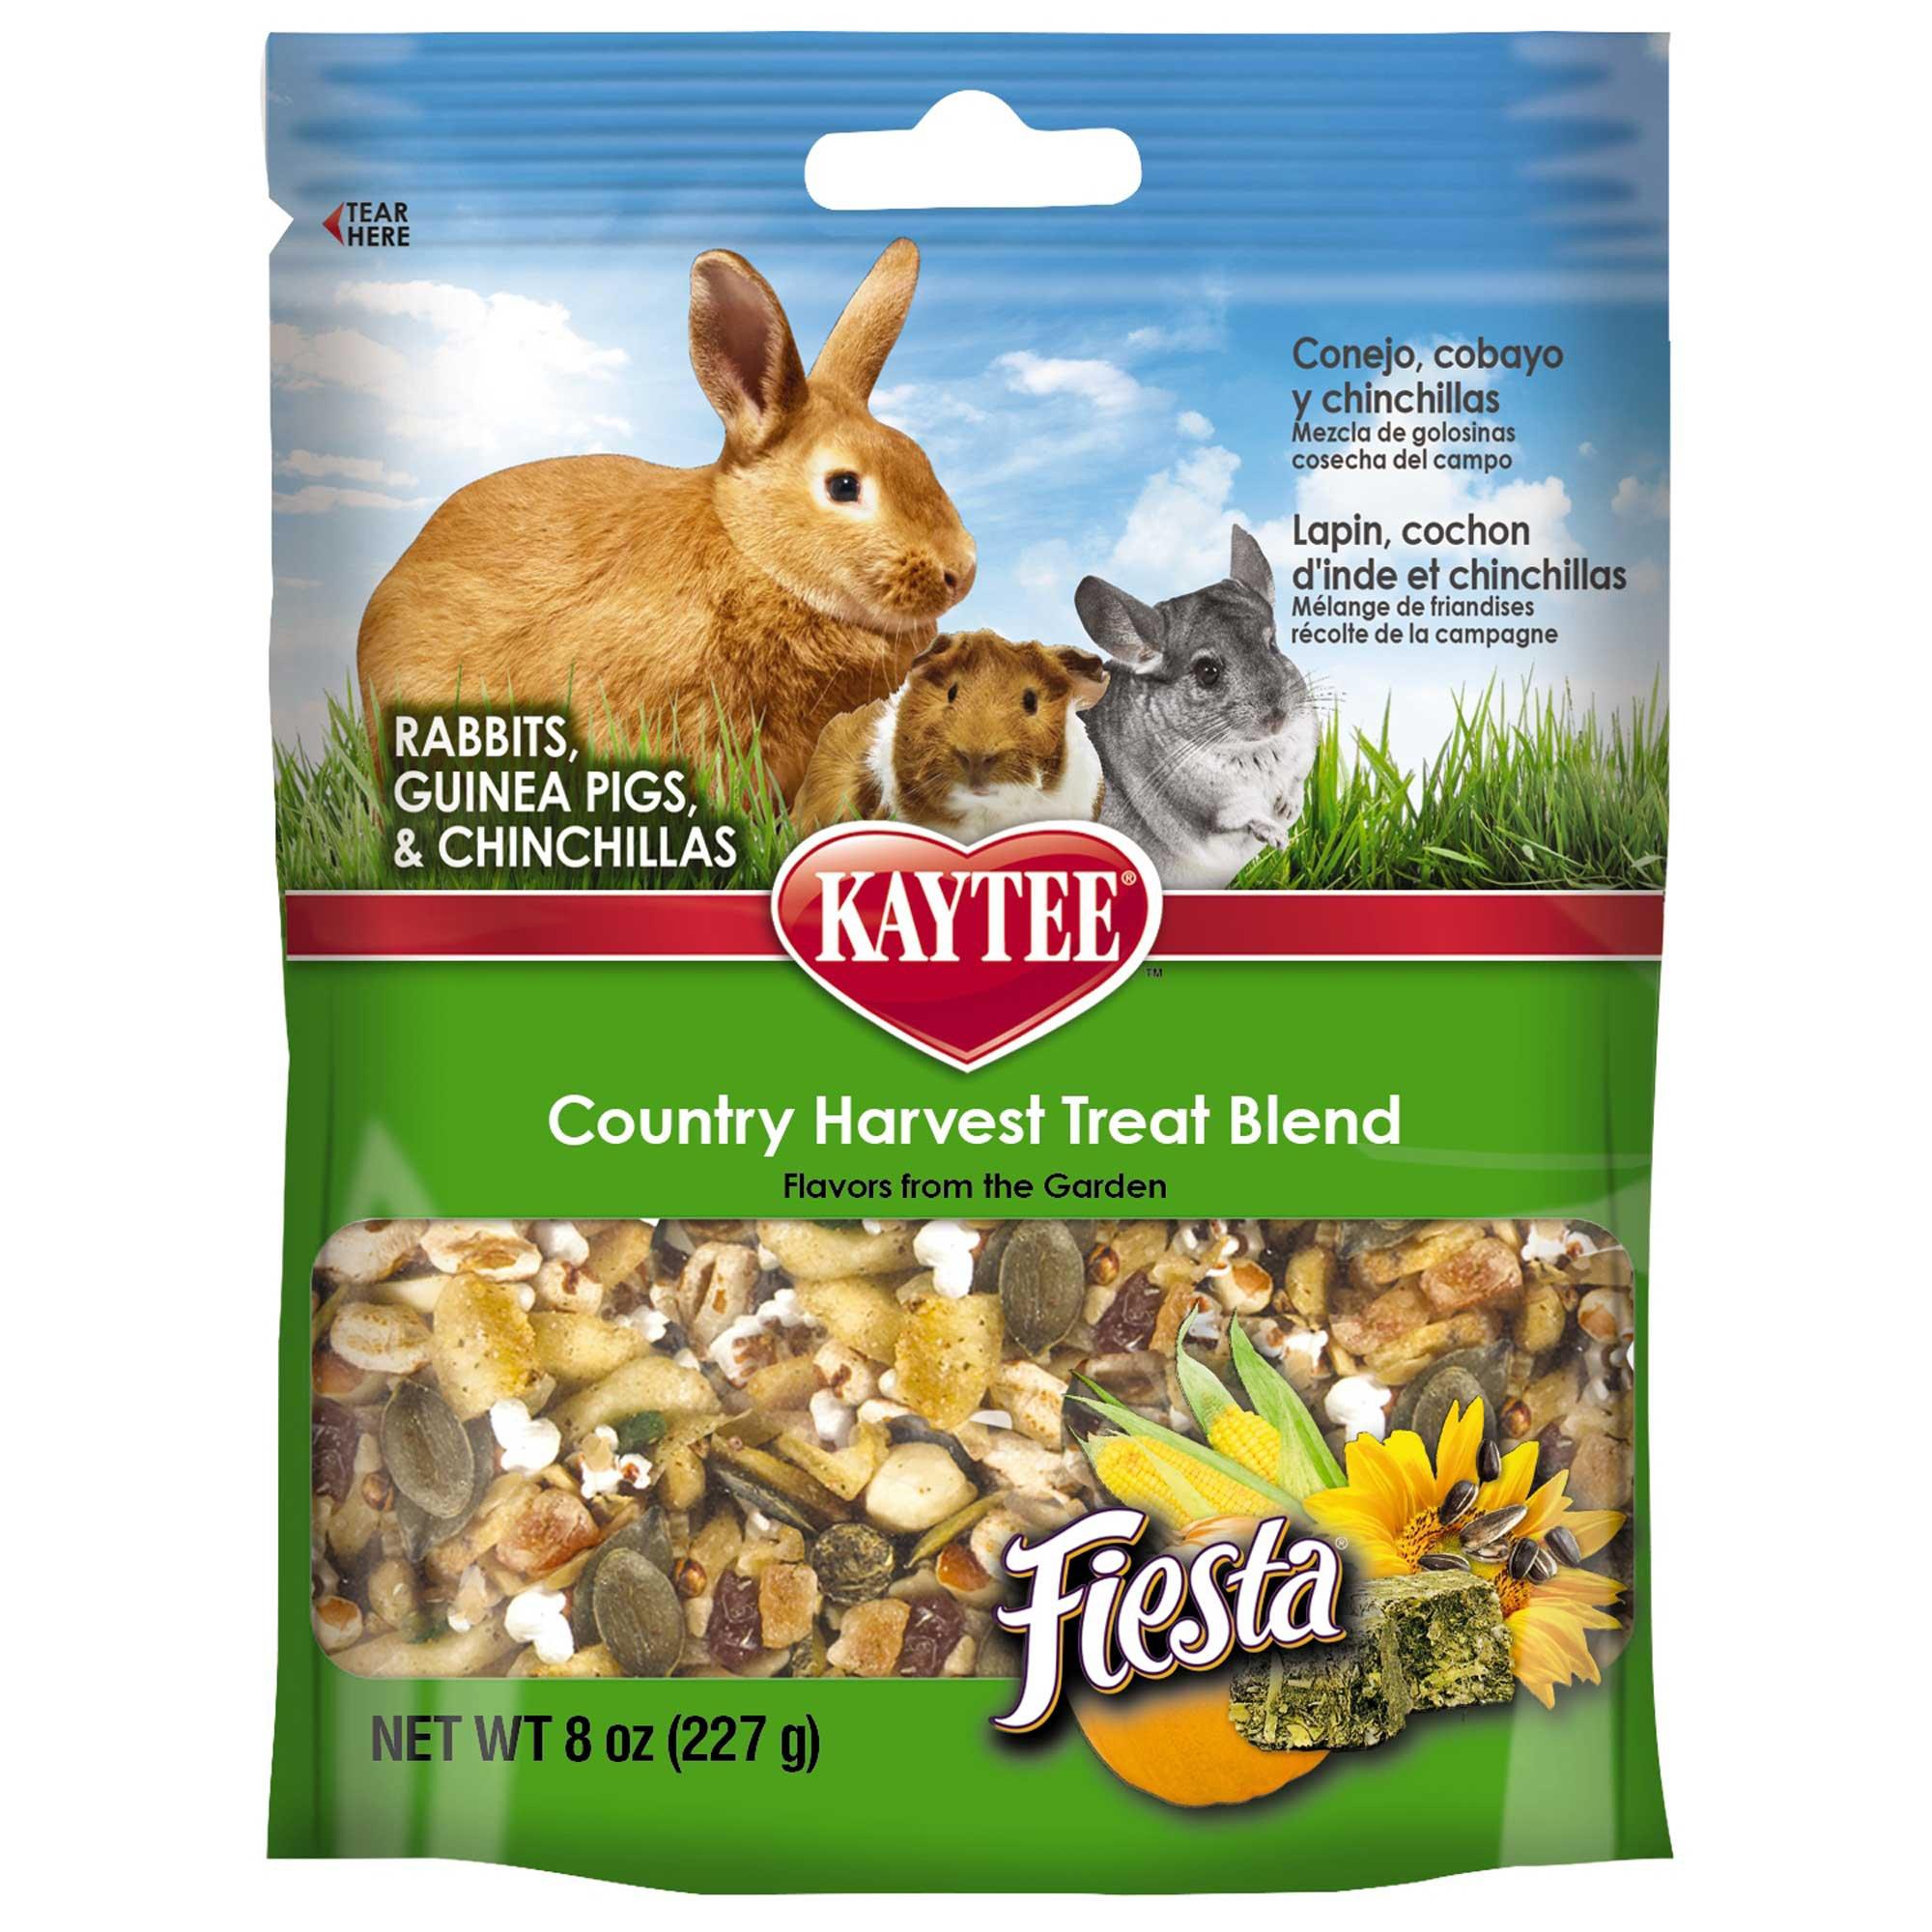 Kaytee Fiesta Country Harvest Blend Rabbit, Guinea Pig and Chinchilla Treat